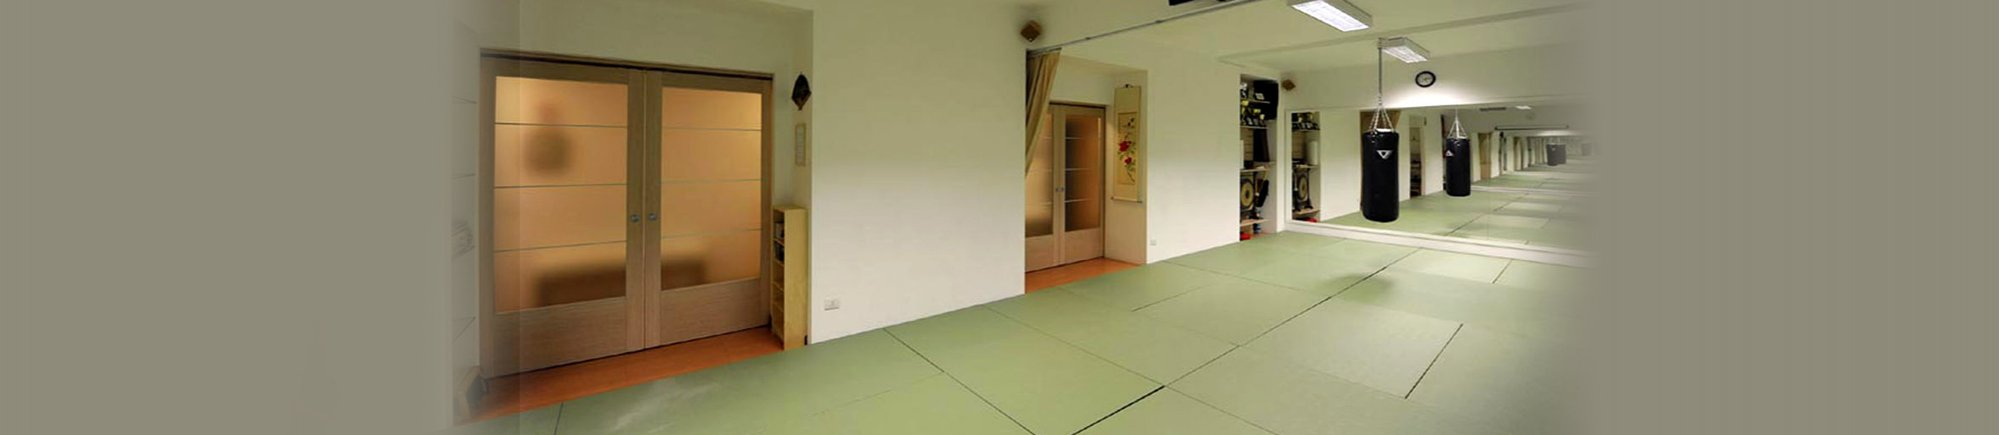 JU JITSU - HAPKIDO - PILATES